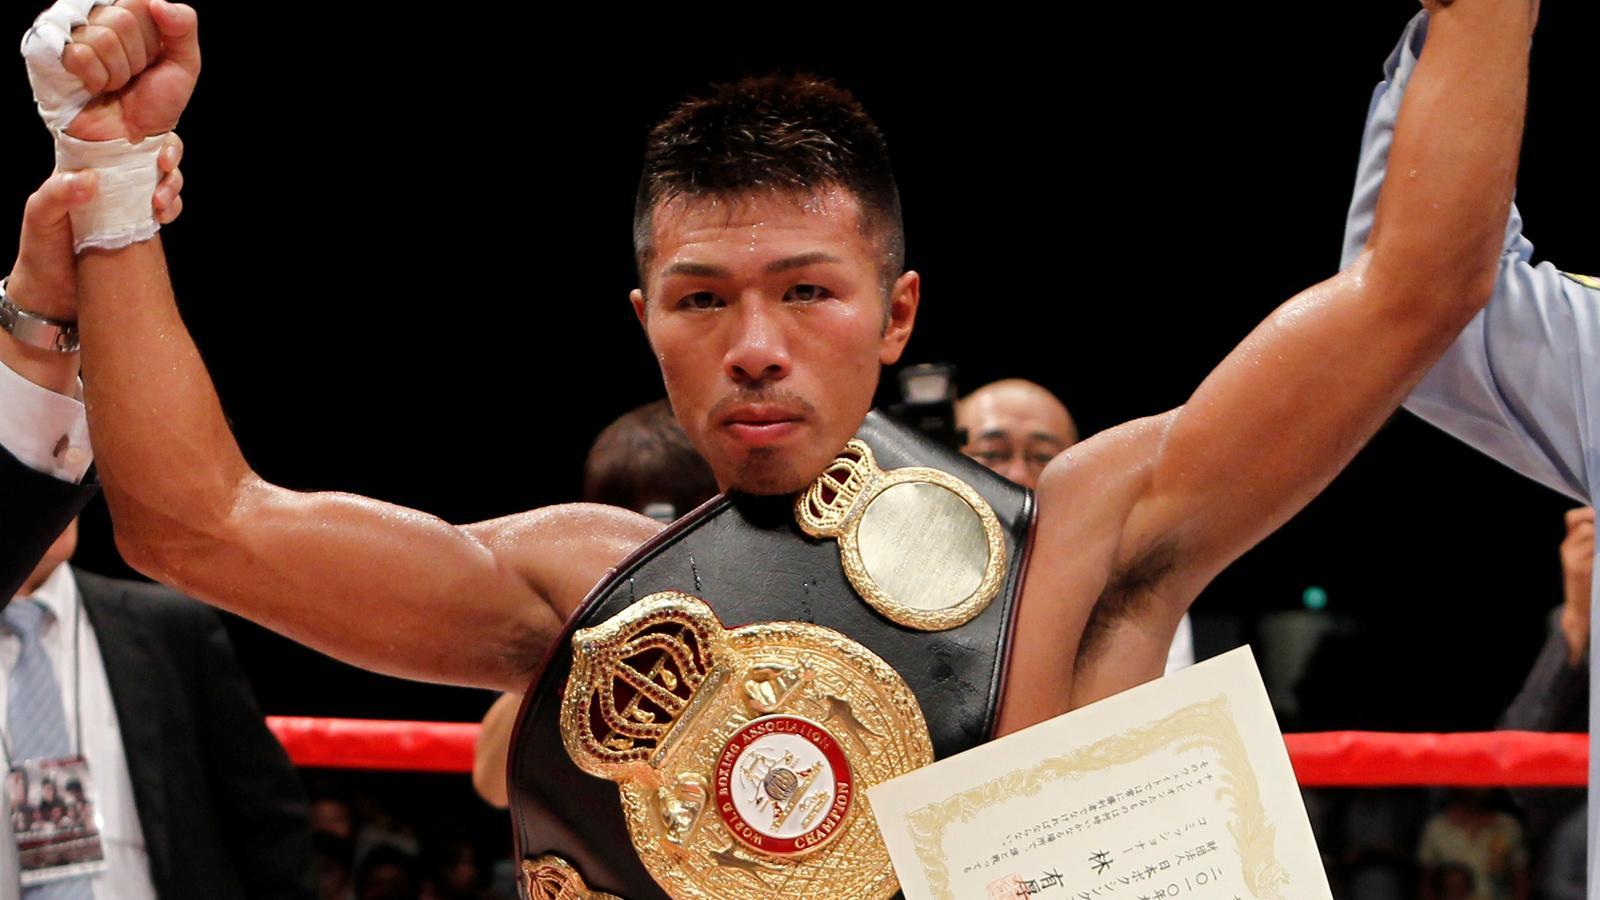 Campeones japoneses donan a tragedia en Nepal